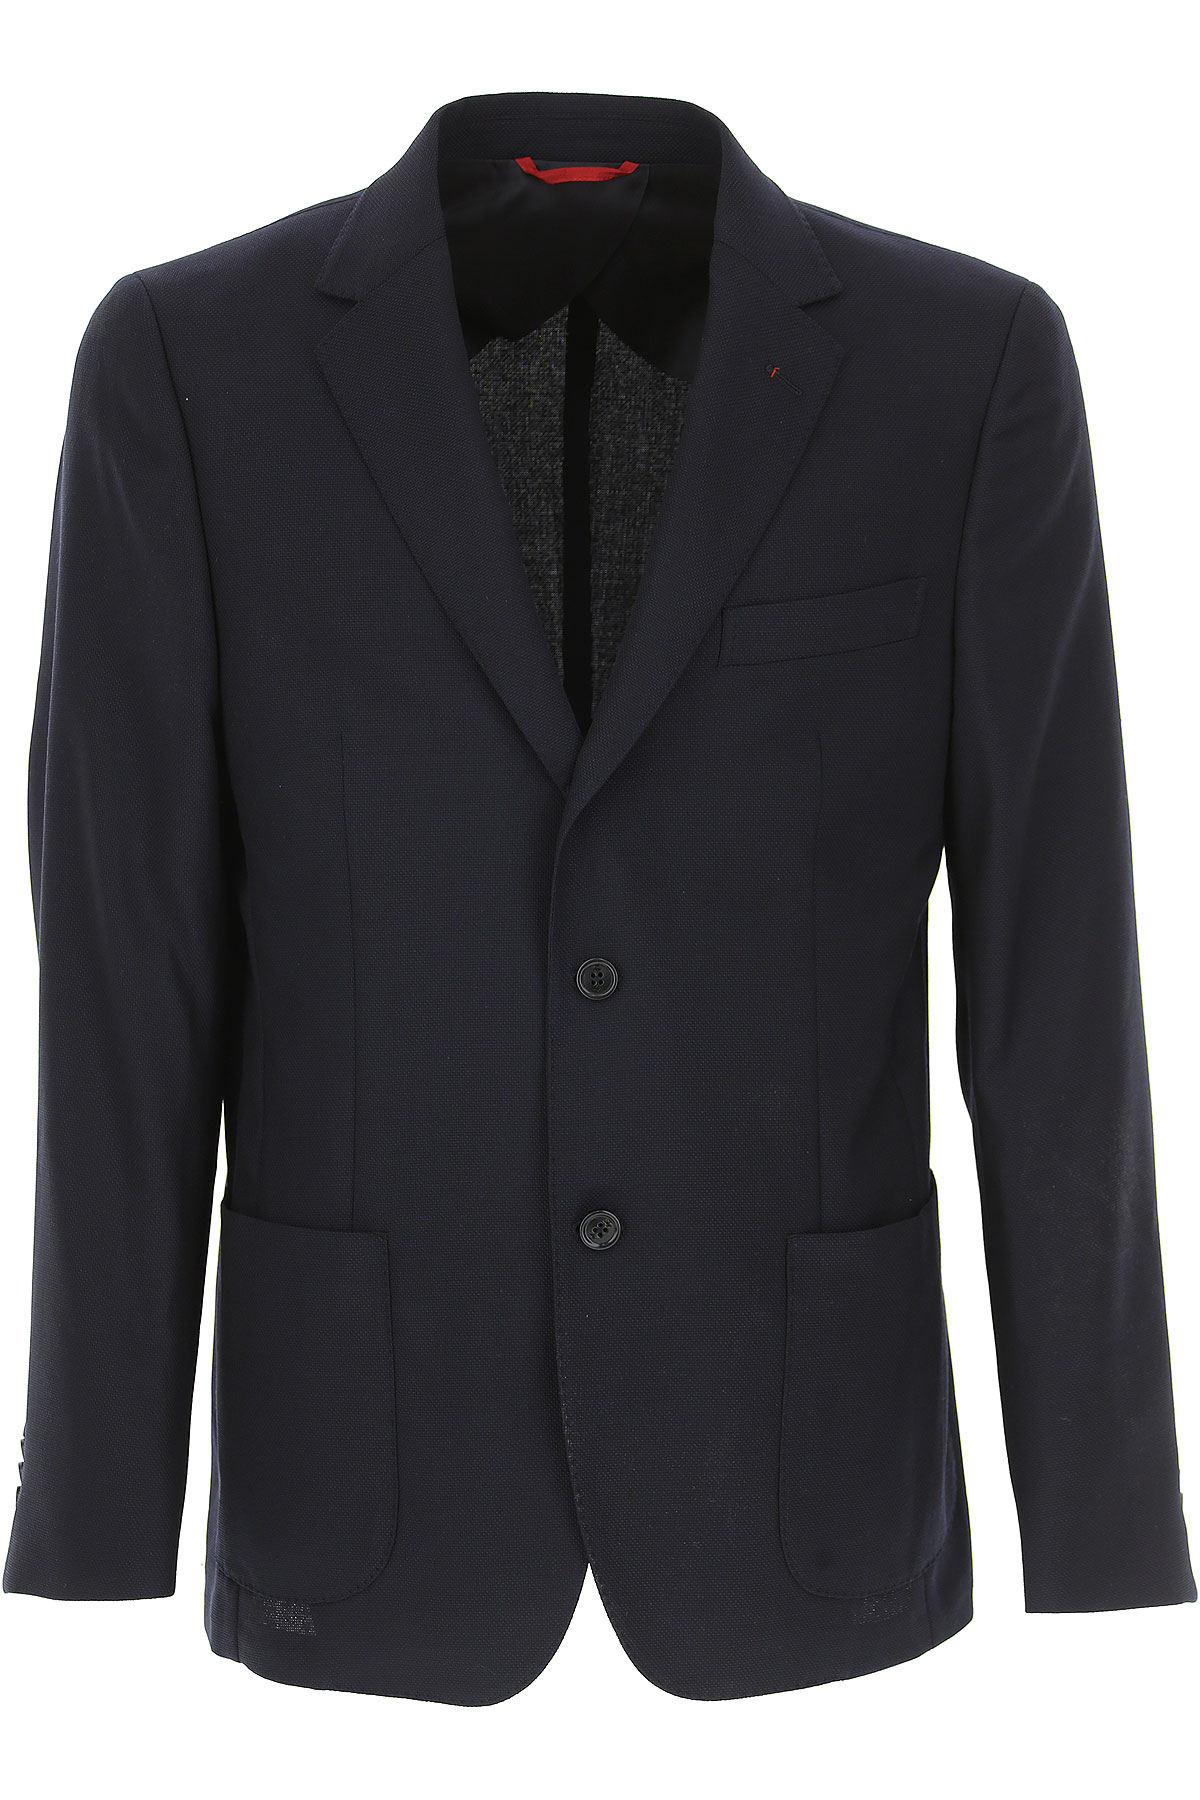 Image of Fay Blazer for Men, Sport Coat, Navy Blue, Wool, 2017, L M